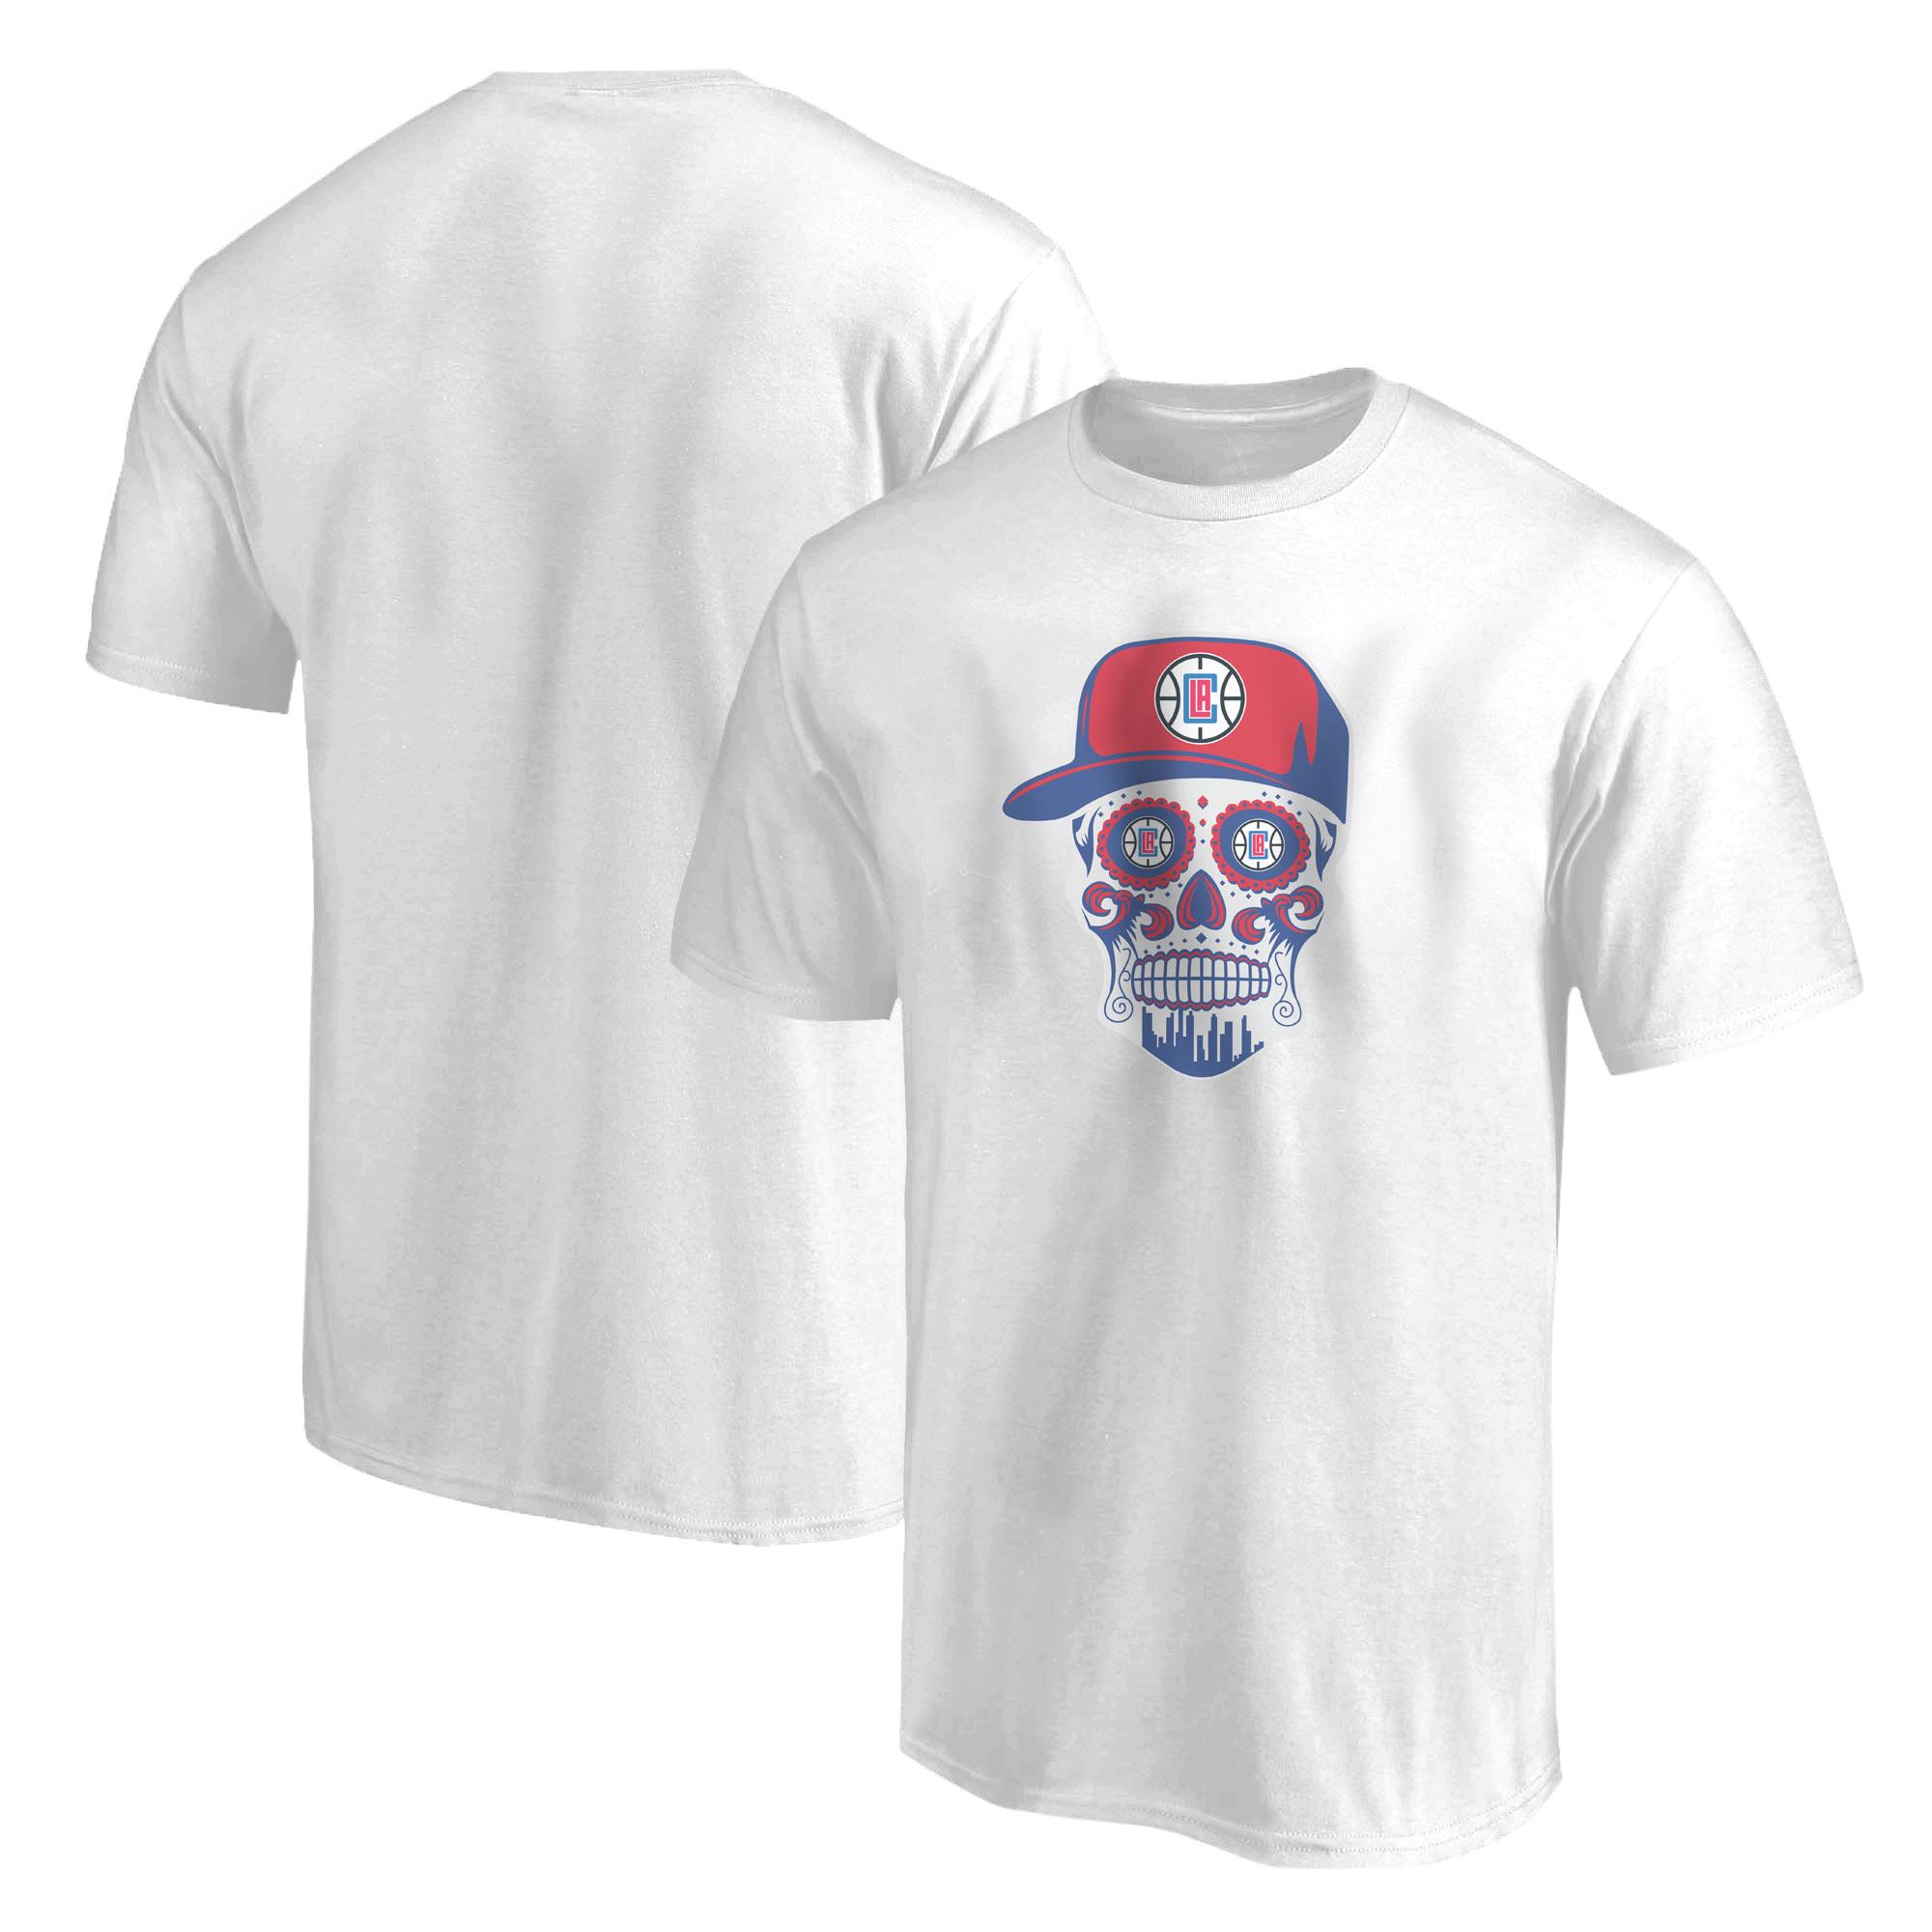 Clippers Skull Tshirt (TSH-WHT-NP-450-CLIPPERS-Skull)